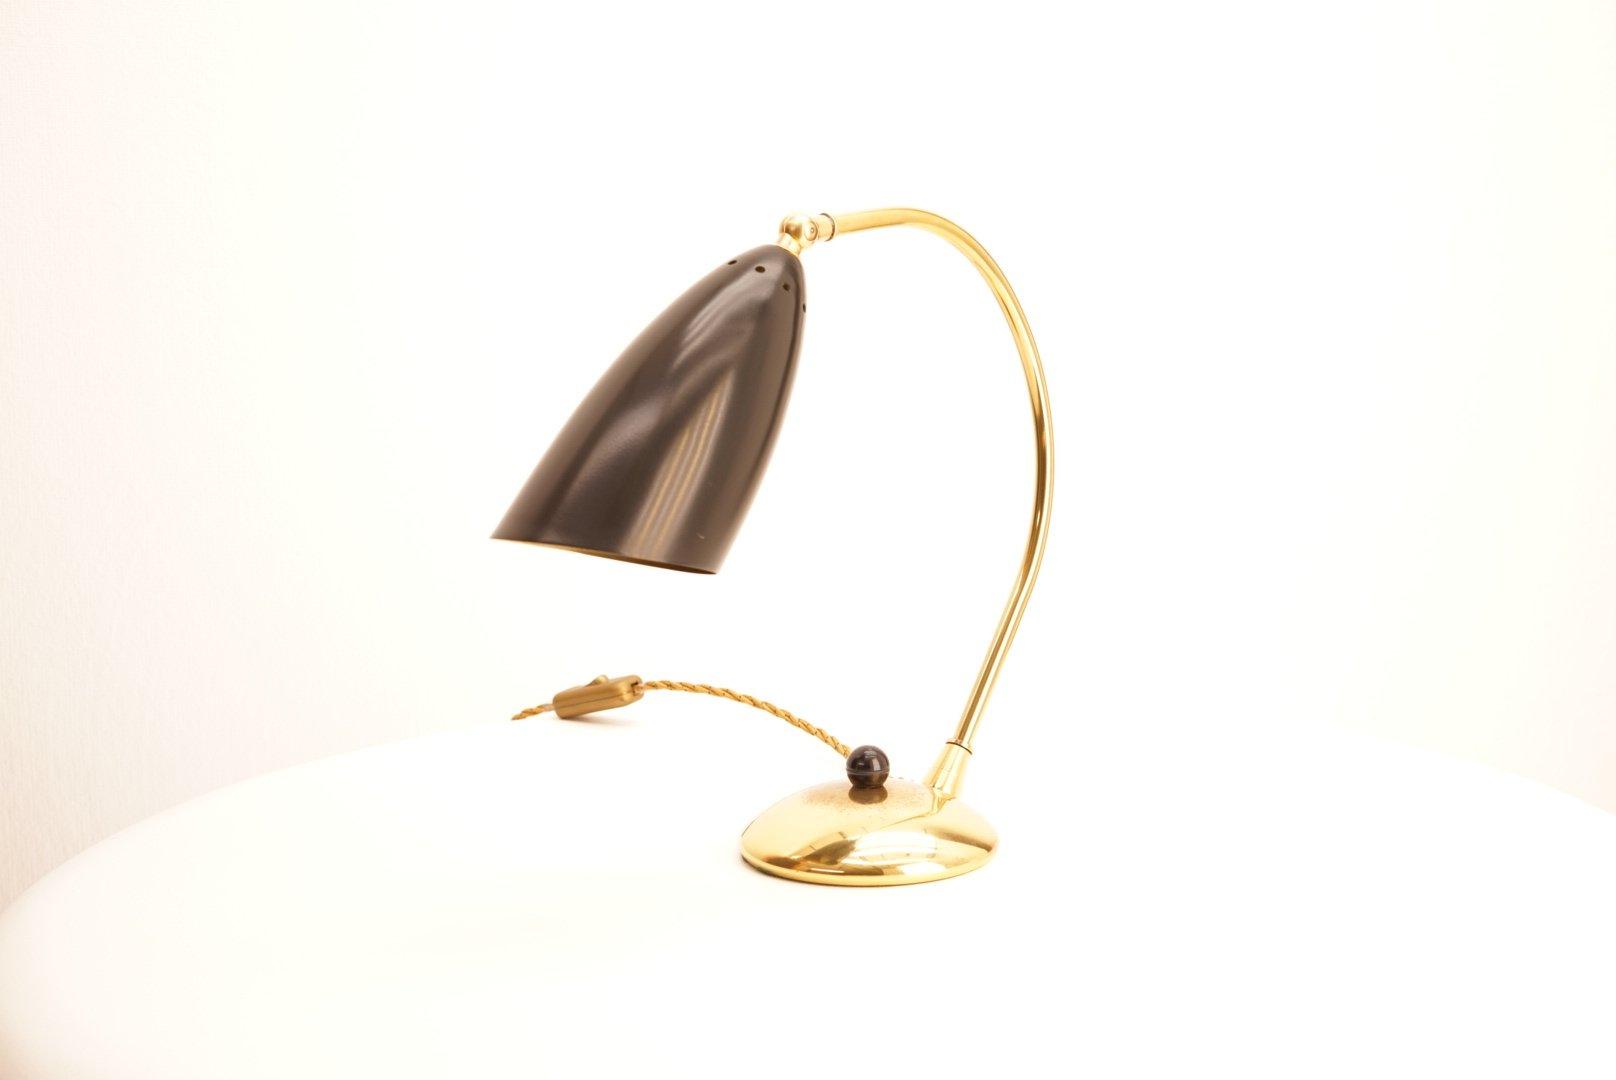 Mid-Century Tischlampen aus Messing, 1950er, 2er Set